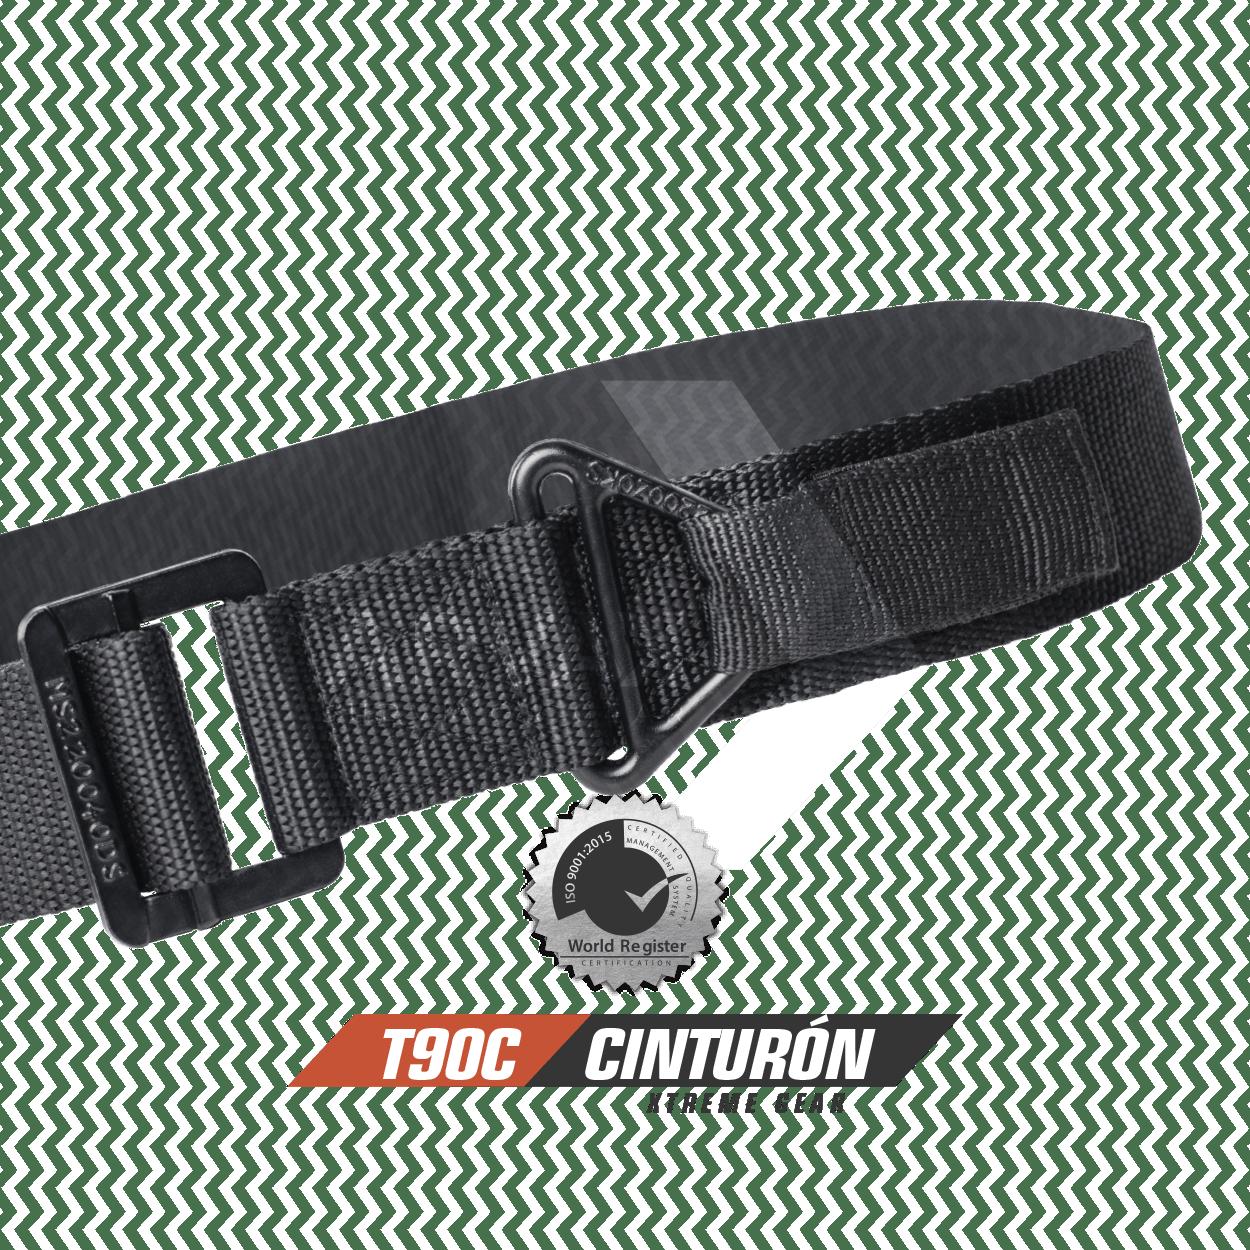 Cinturon T90C Arvak Tactical